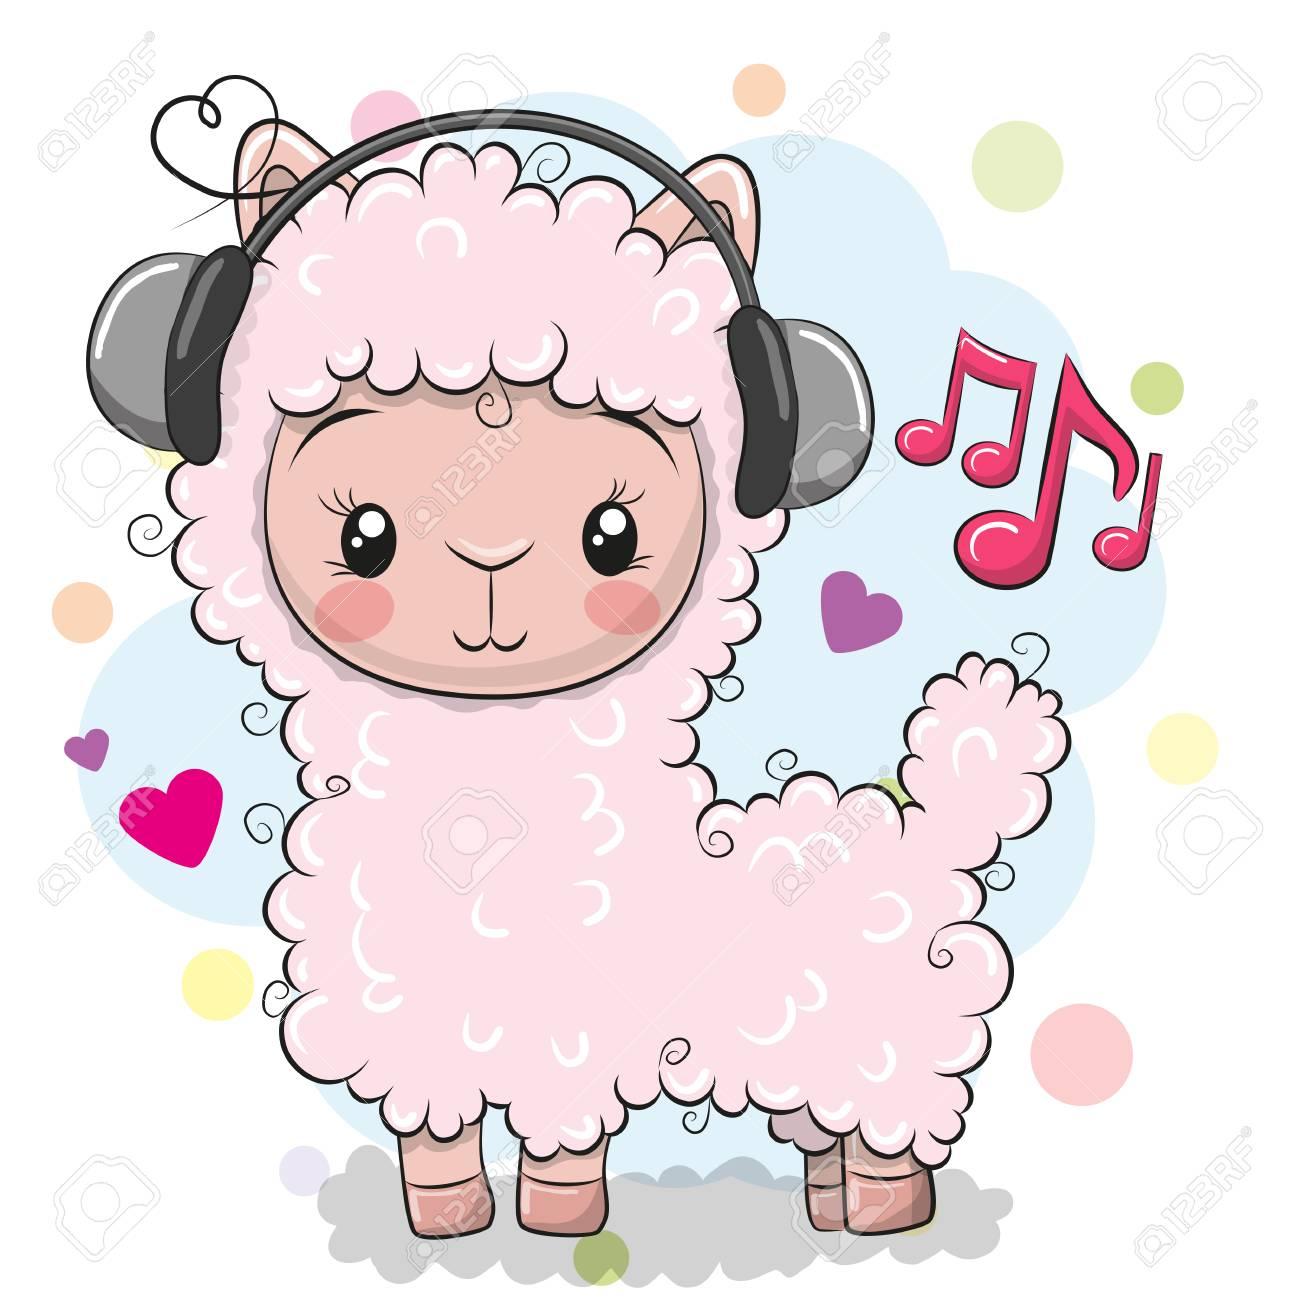 Cute Cartoon Alpaca with headphones on a white background - 100999240